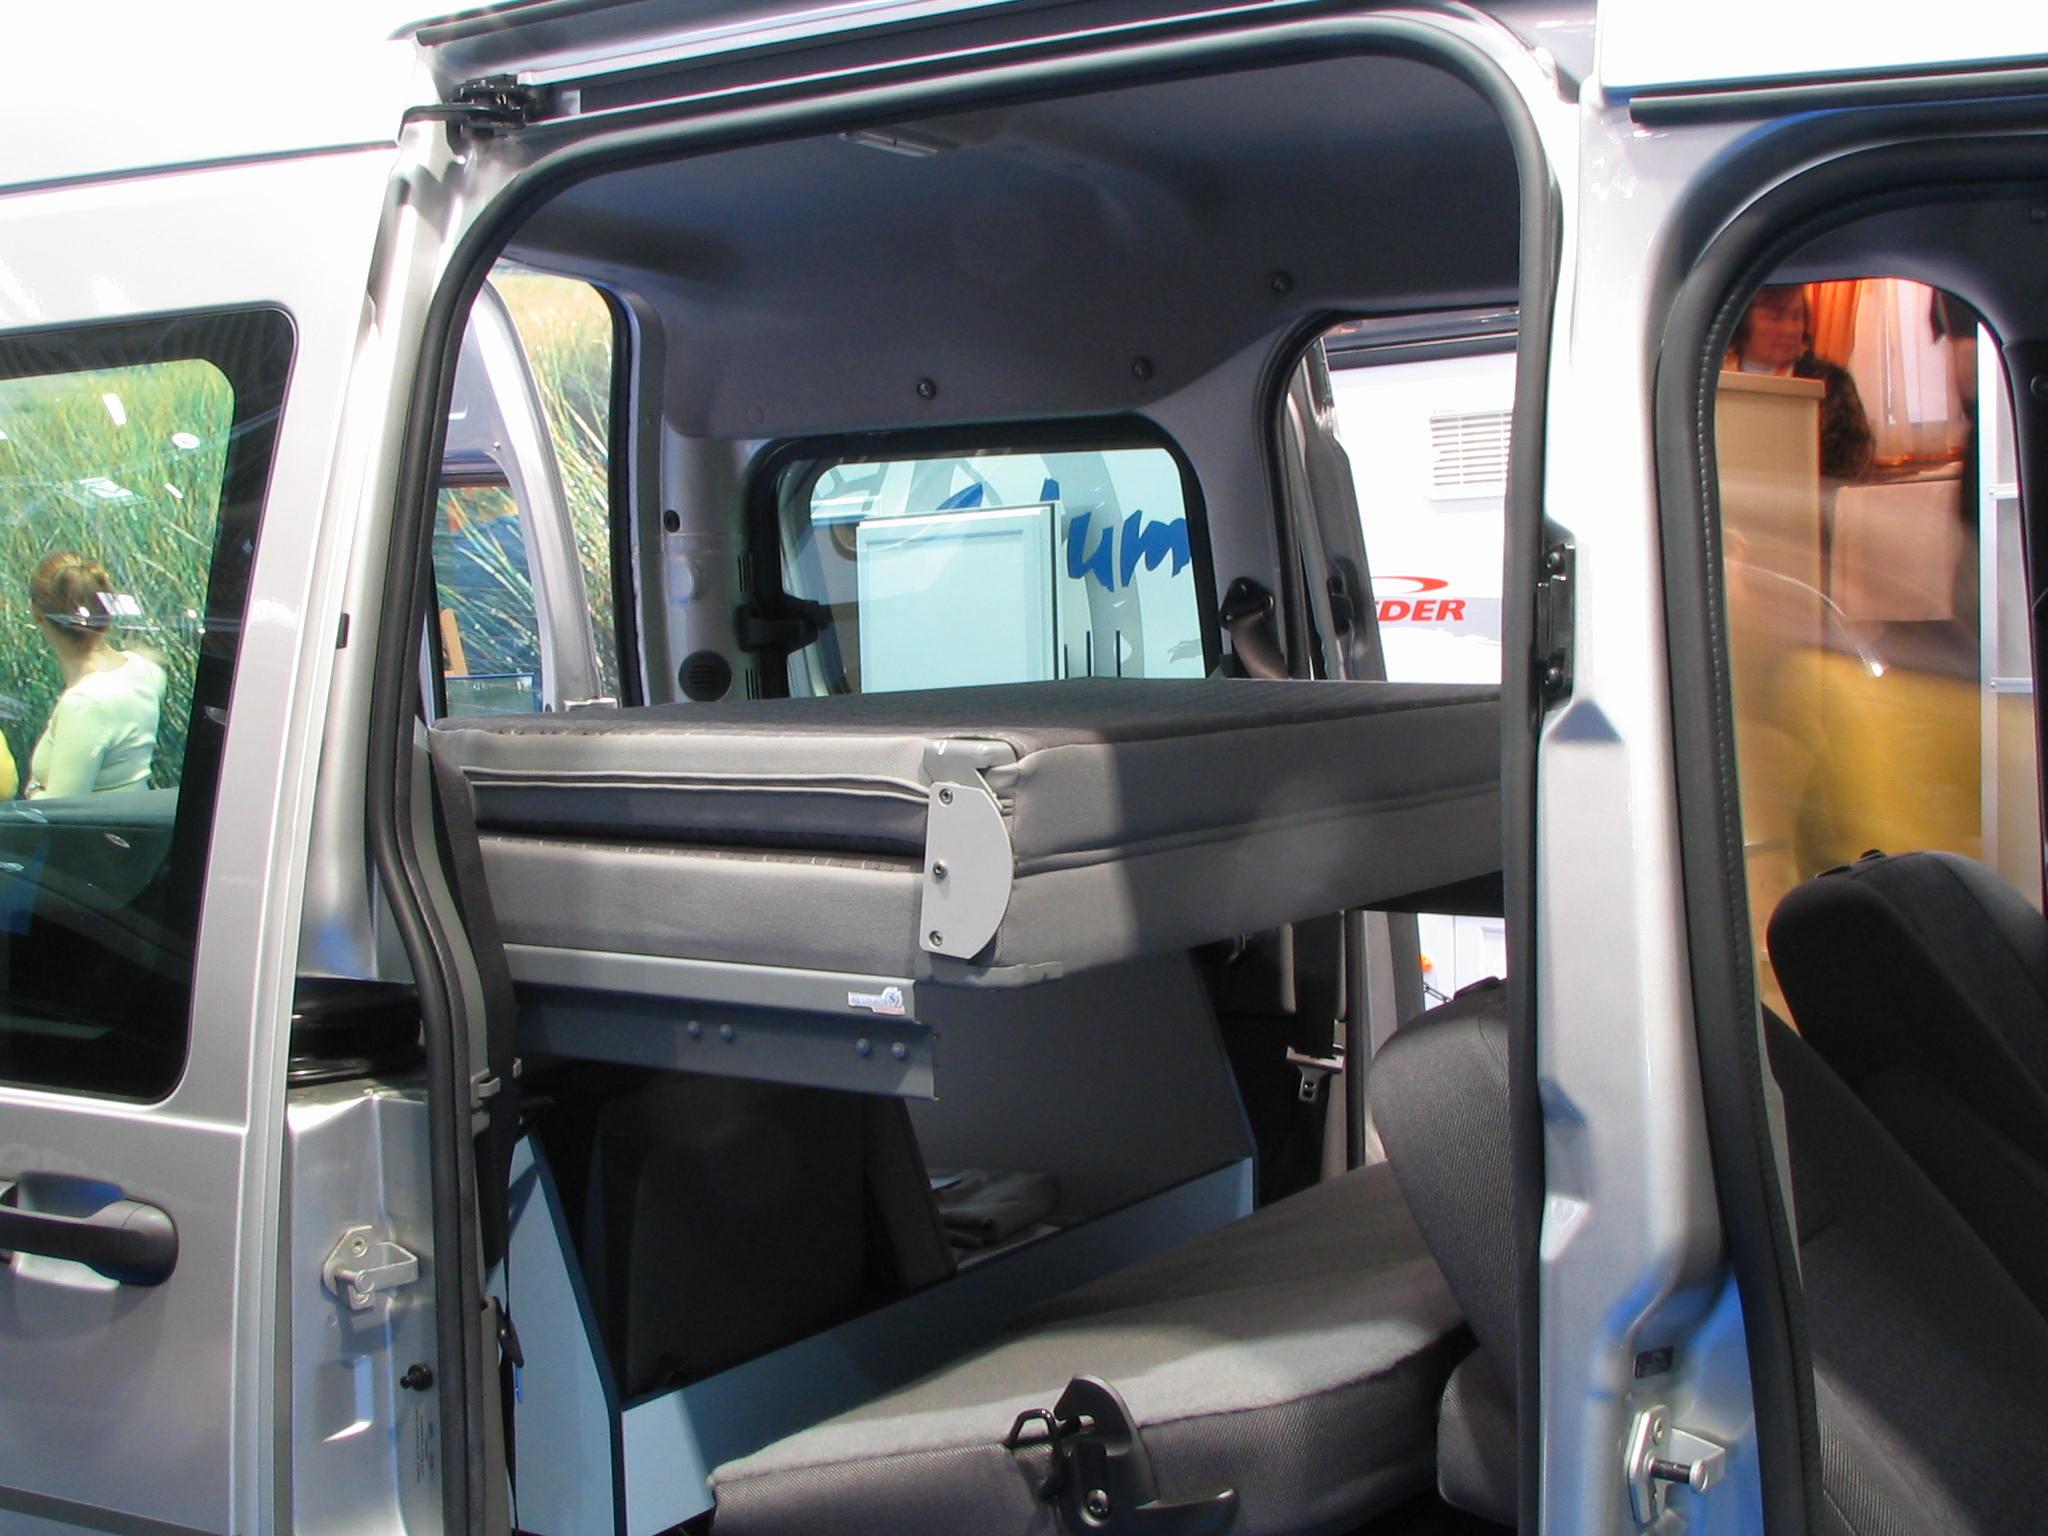 ford transit connect camper - Ford Transit Connect Interior Camper